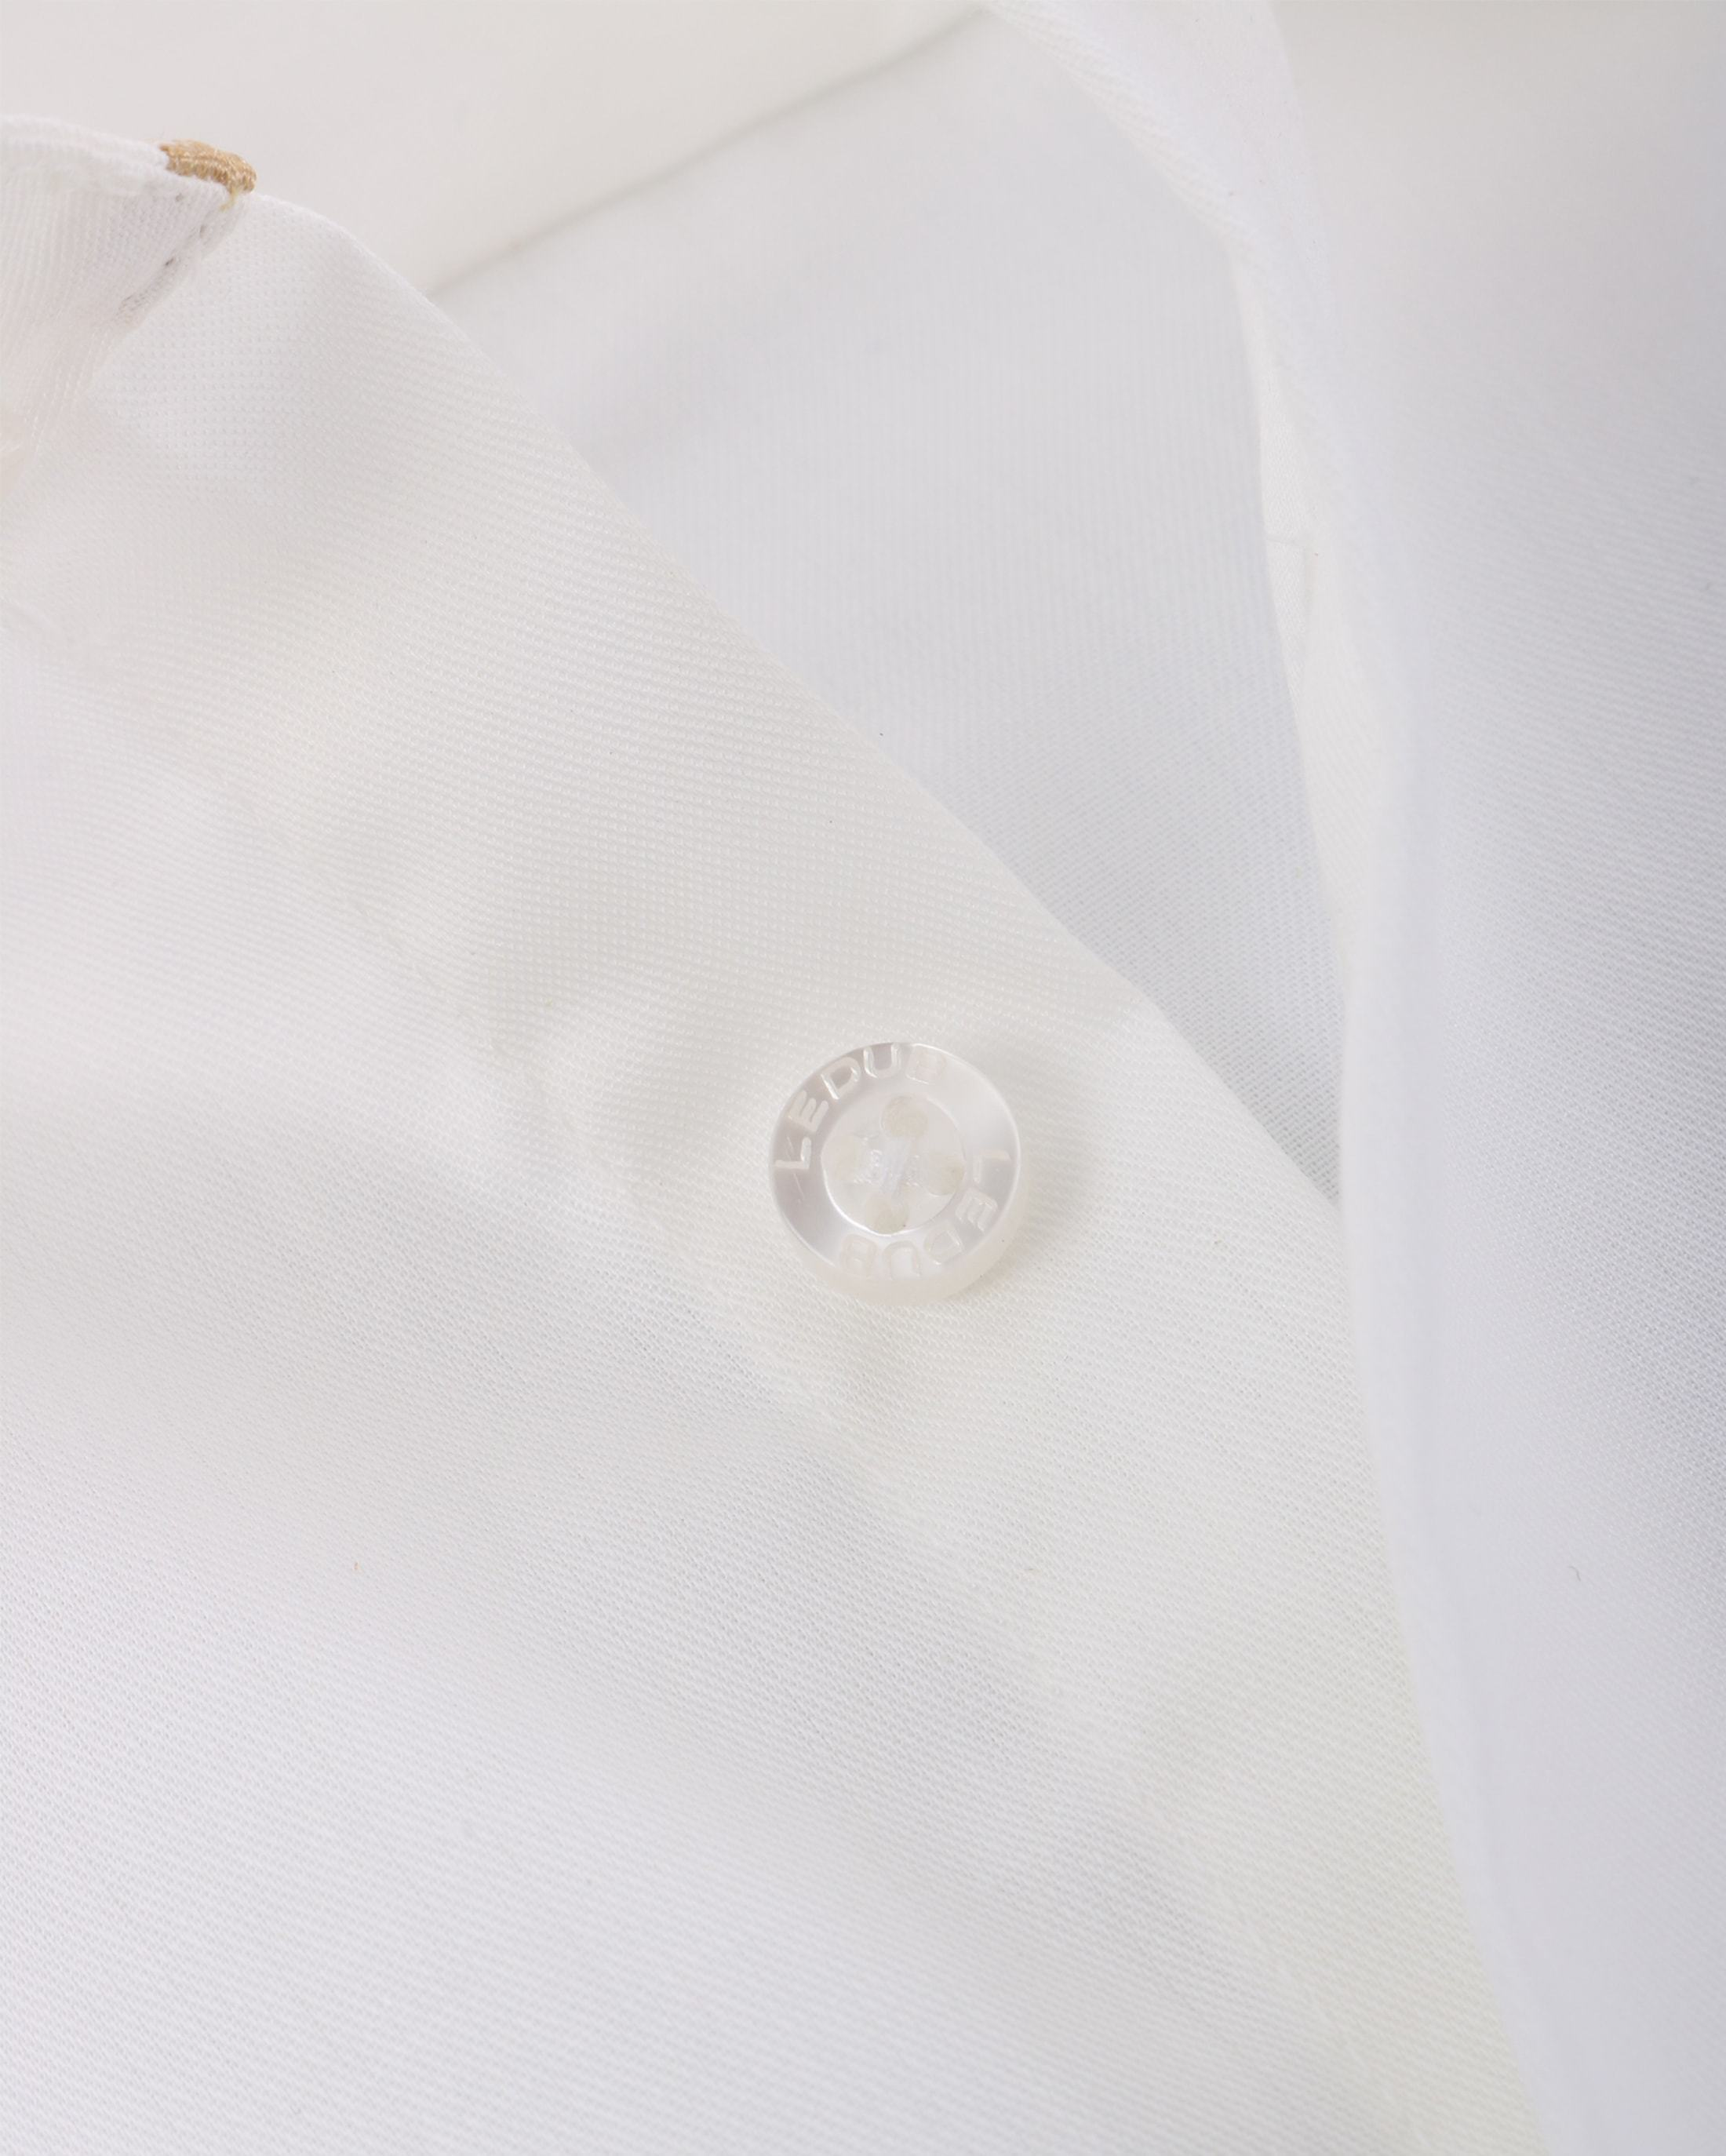 Ledub Hochzeit Hemd Bügelfrei Ecru foto 3